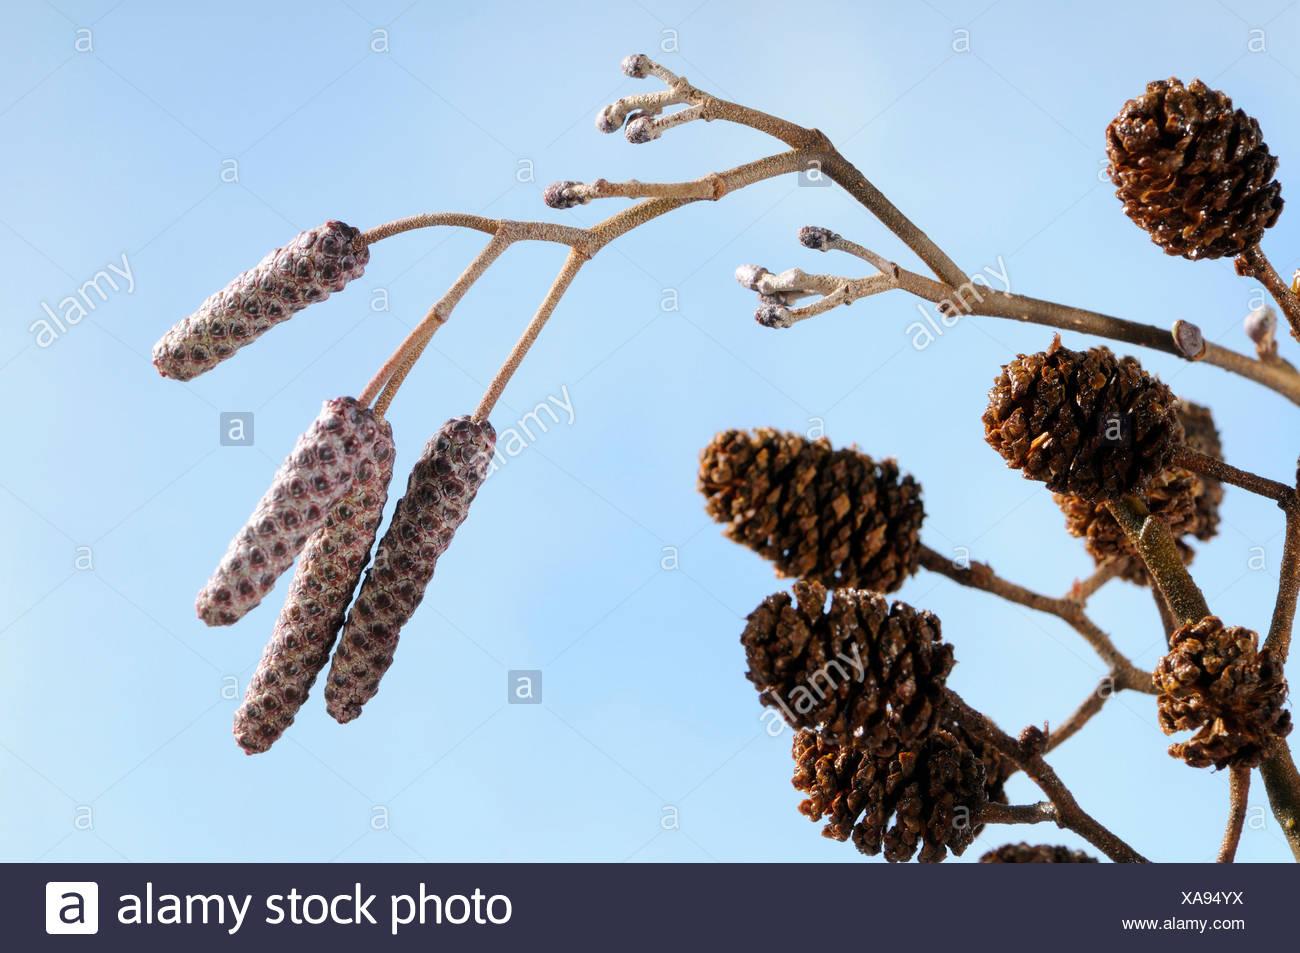 Black alder, European alder, common alder, inflorescences / (Alnus glutinosa) Stock Photo